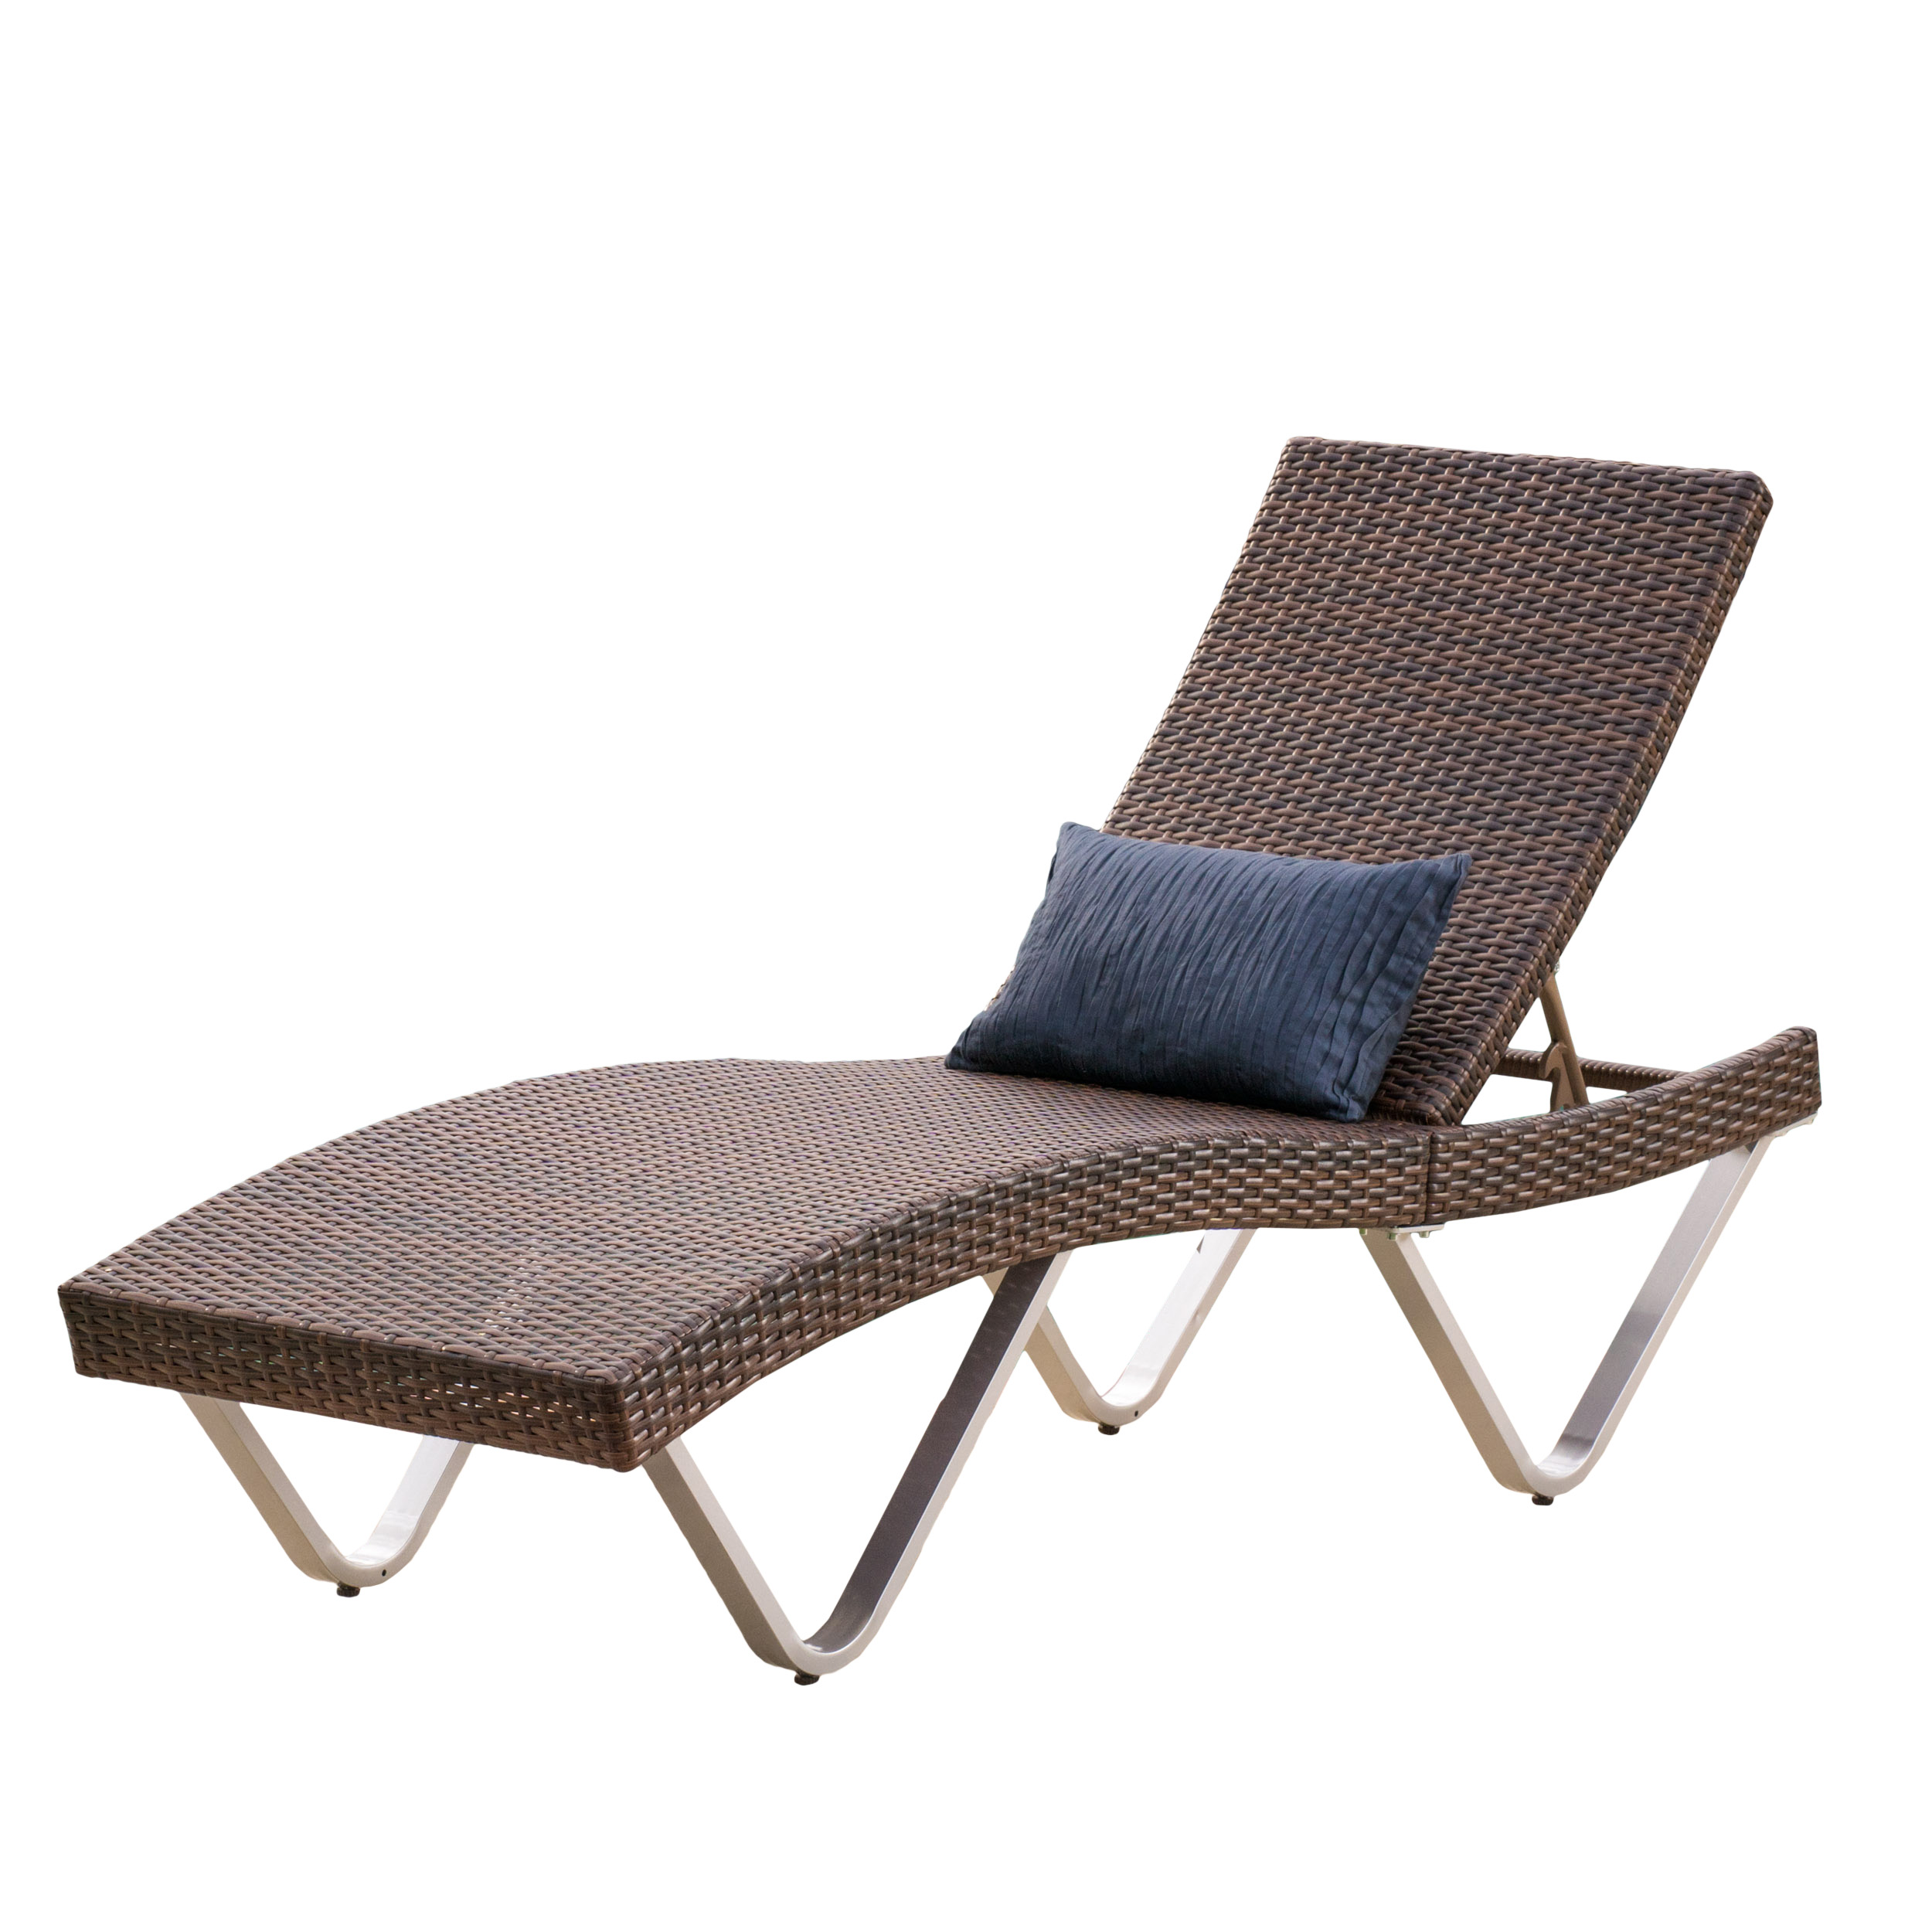 San Jose Outdoor Wicker Single Chaise Lounge